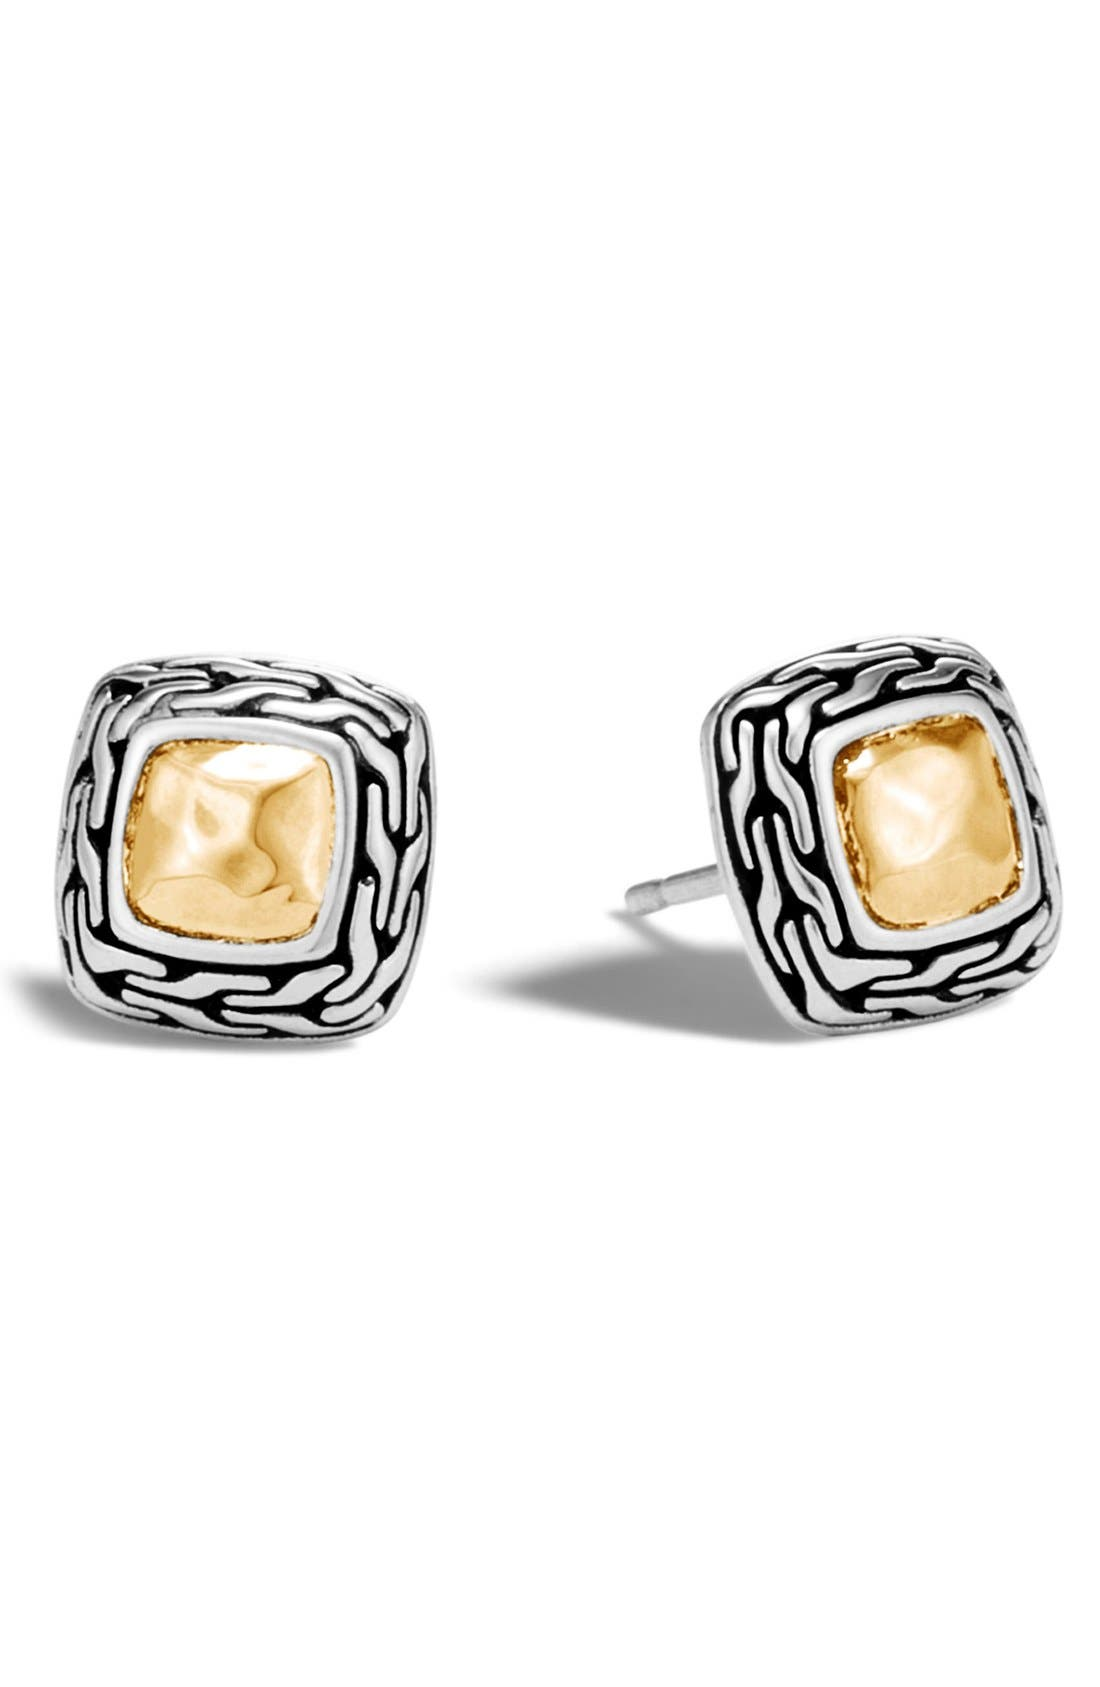 JOHN HARDY Heritage Stud Earrings, Main, color, SILVER/ GOLD